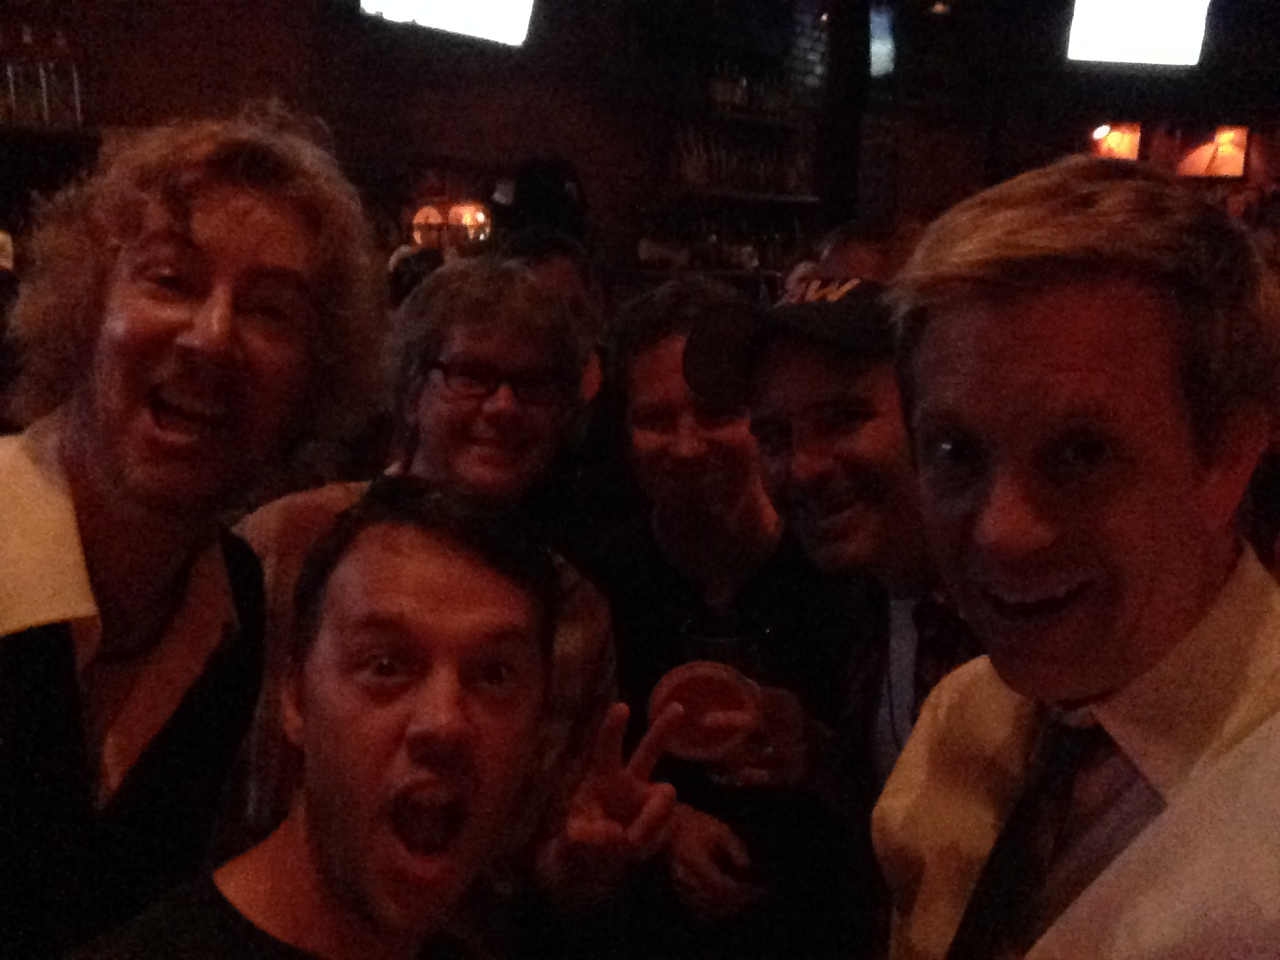 Interpreting Peter Gabriel Night @ Molly Malones, LA w/ Lyle Workman, Blair Sinta, John Paterno, Matt Rohde, Marcus Wolf 2014